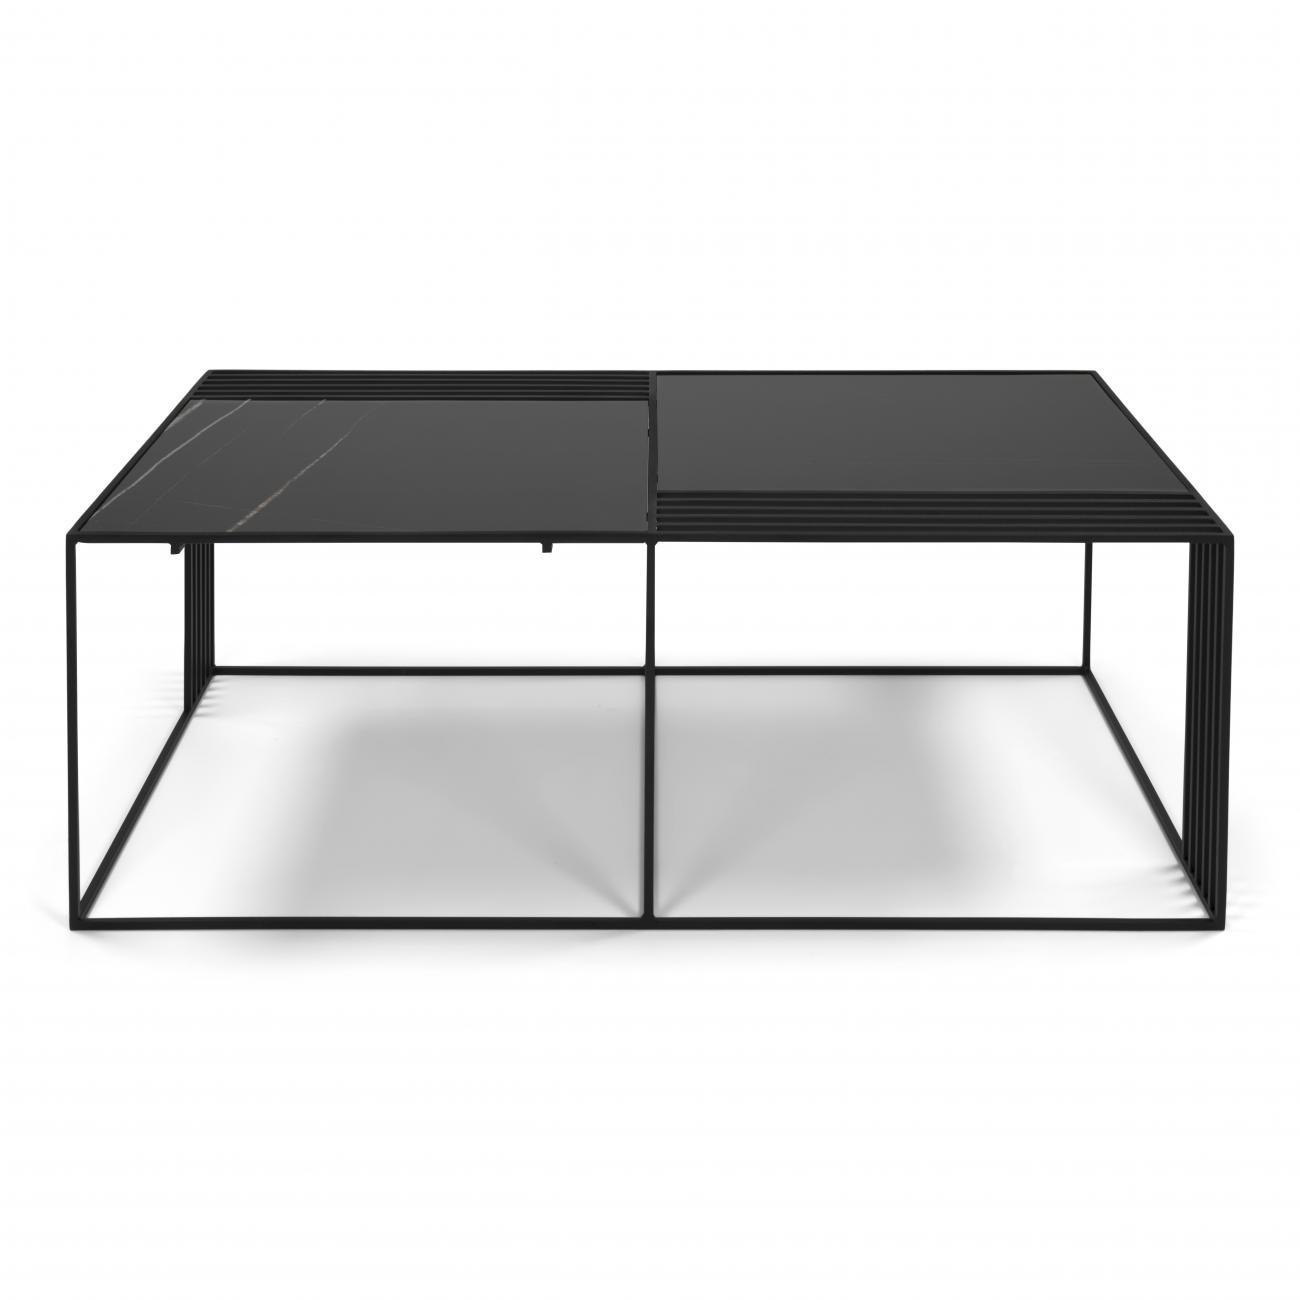 Torna Design Lattice 4 salontafel Zwart